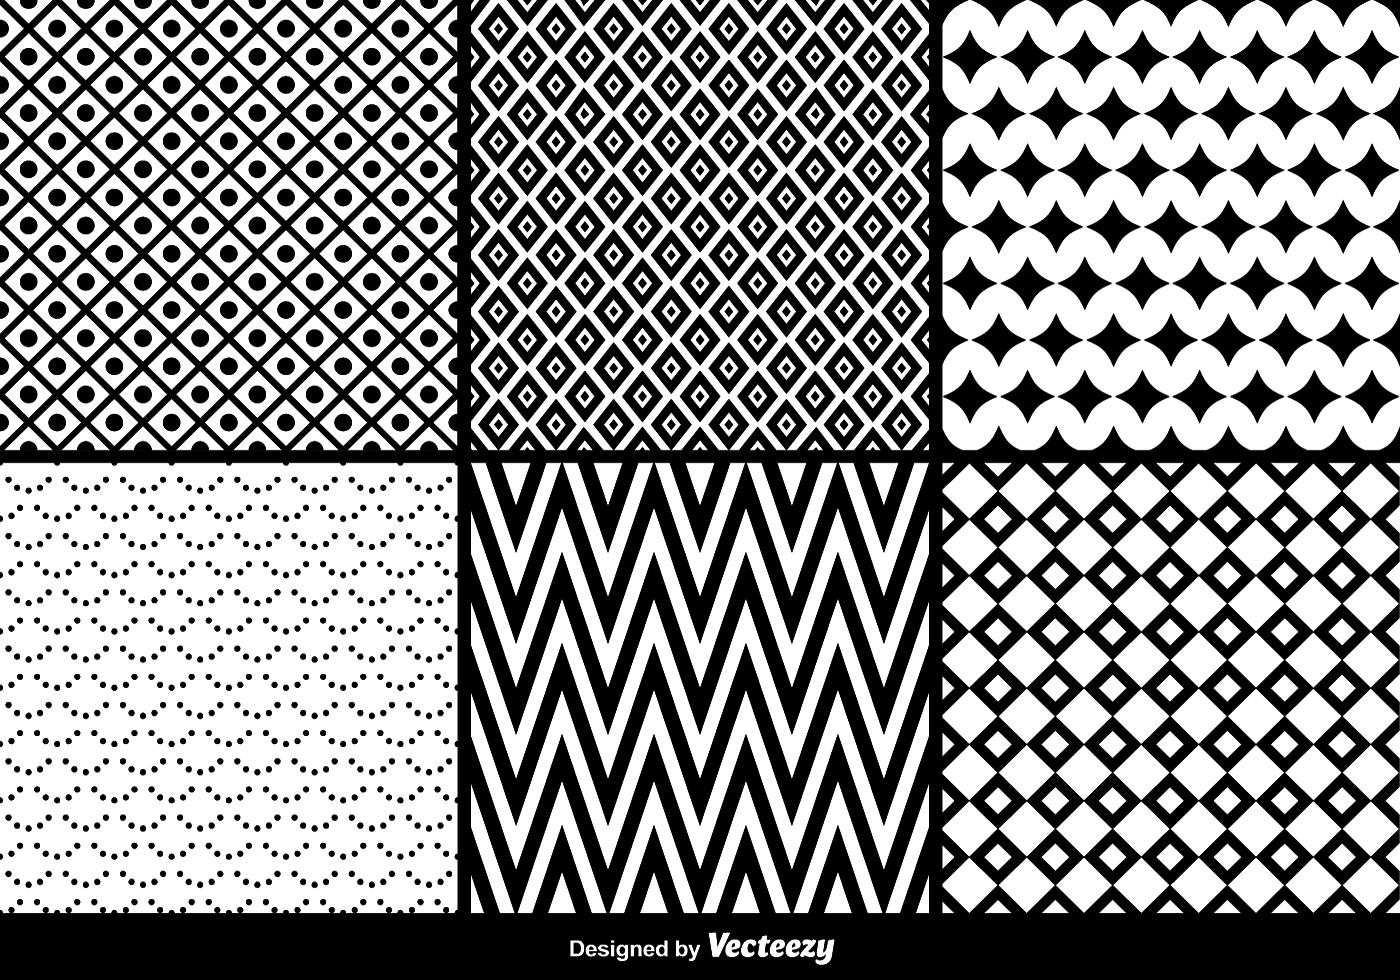 black-and-white-flashing-layout